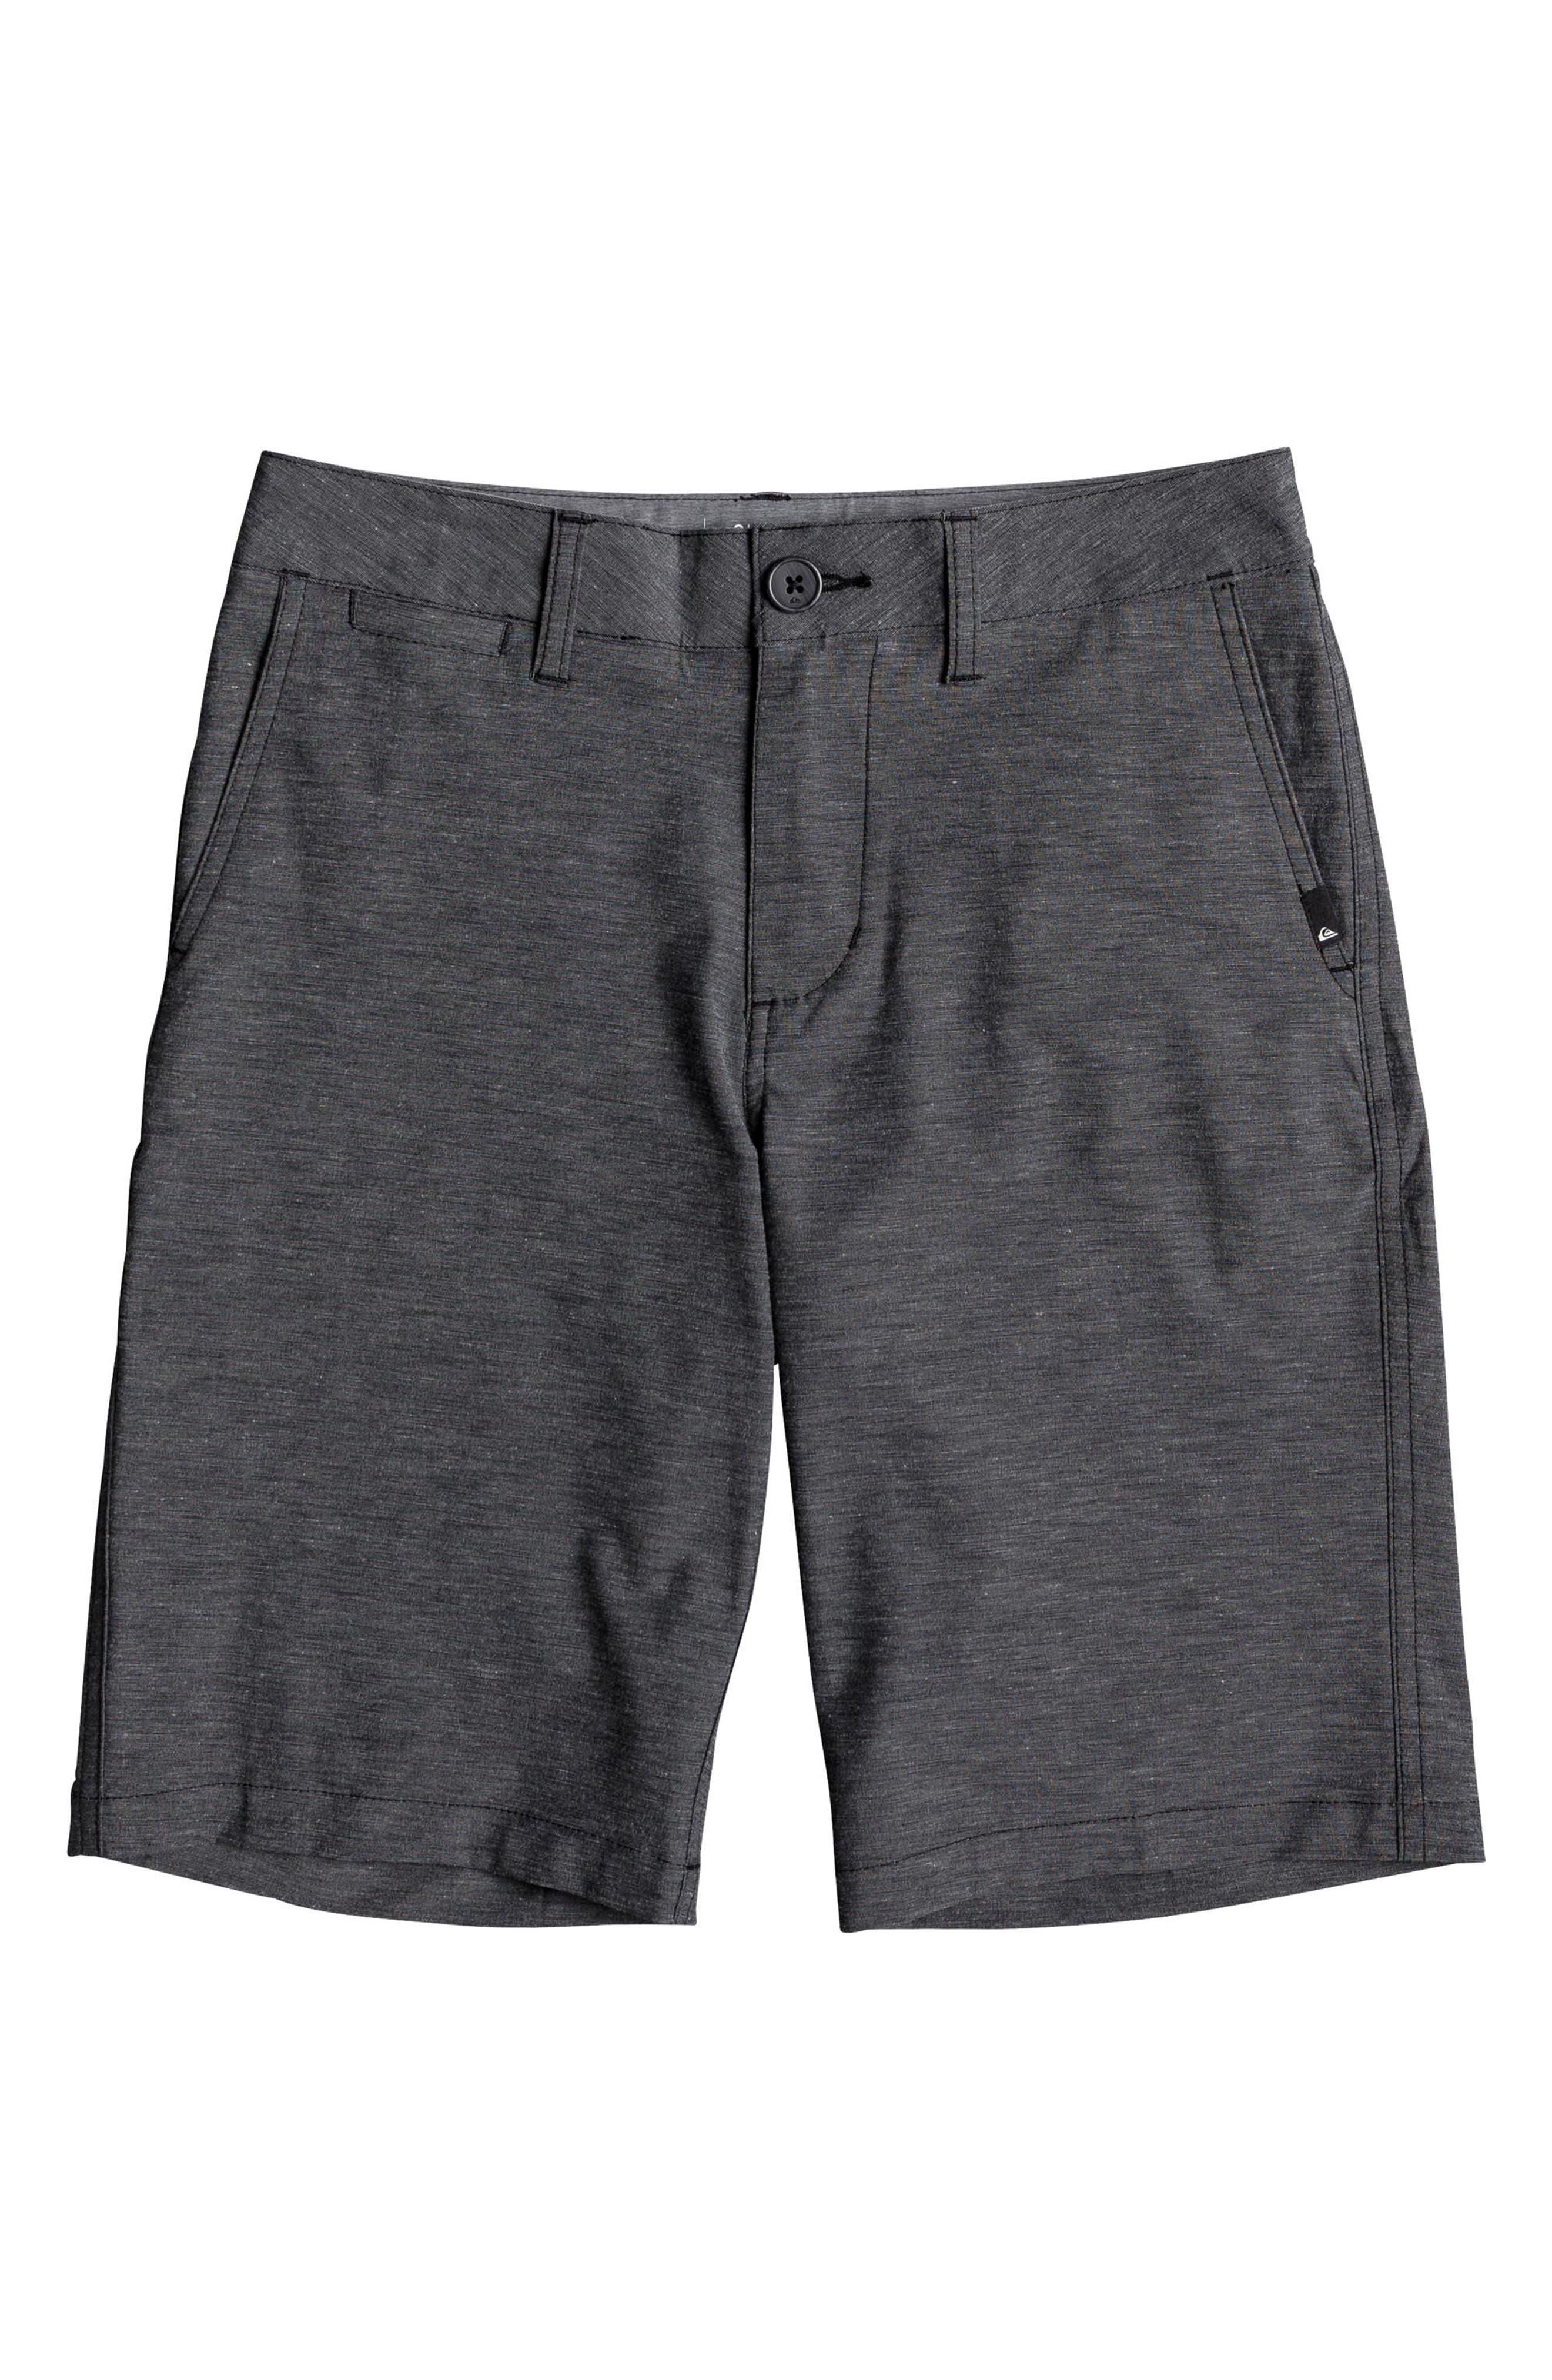 Union Heather Amphibian Hybrid Shorts,                             Main thumbnail 1, color,                             BLACK